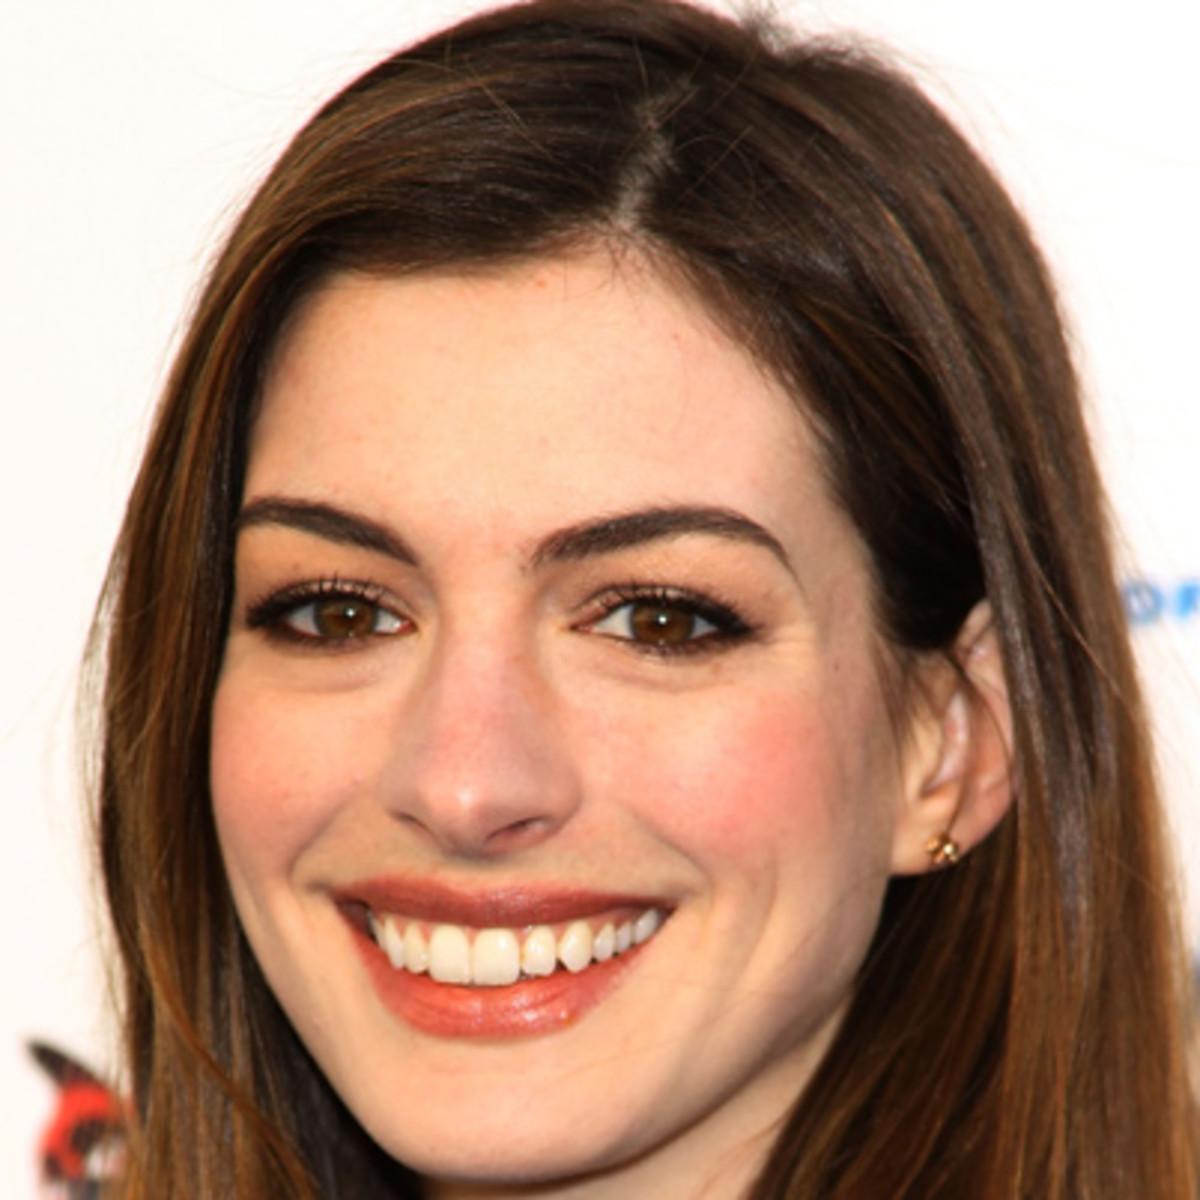 Anne Hathaway Bio, Wife, Net Worth, Brother, Married, Kids ...